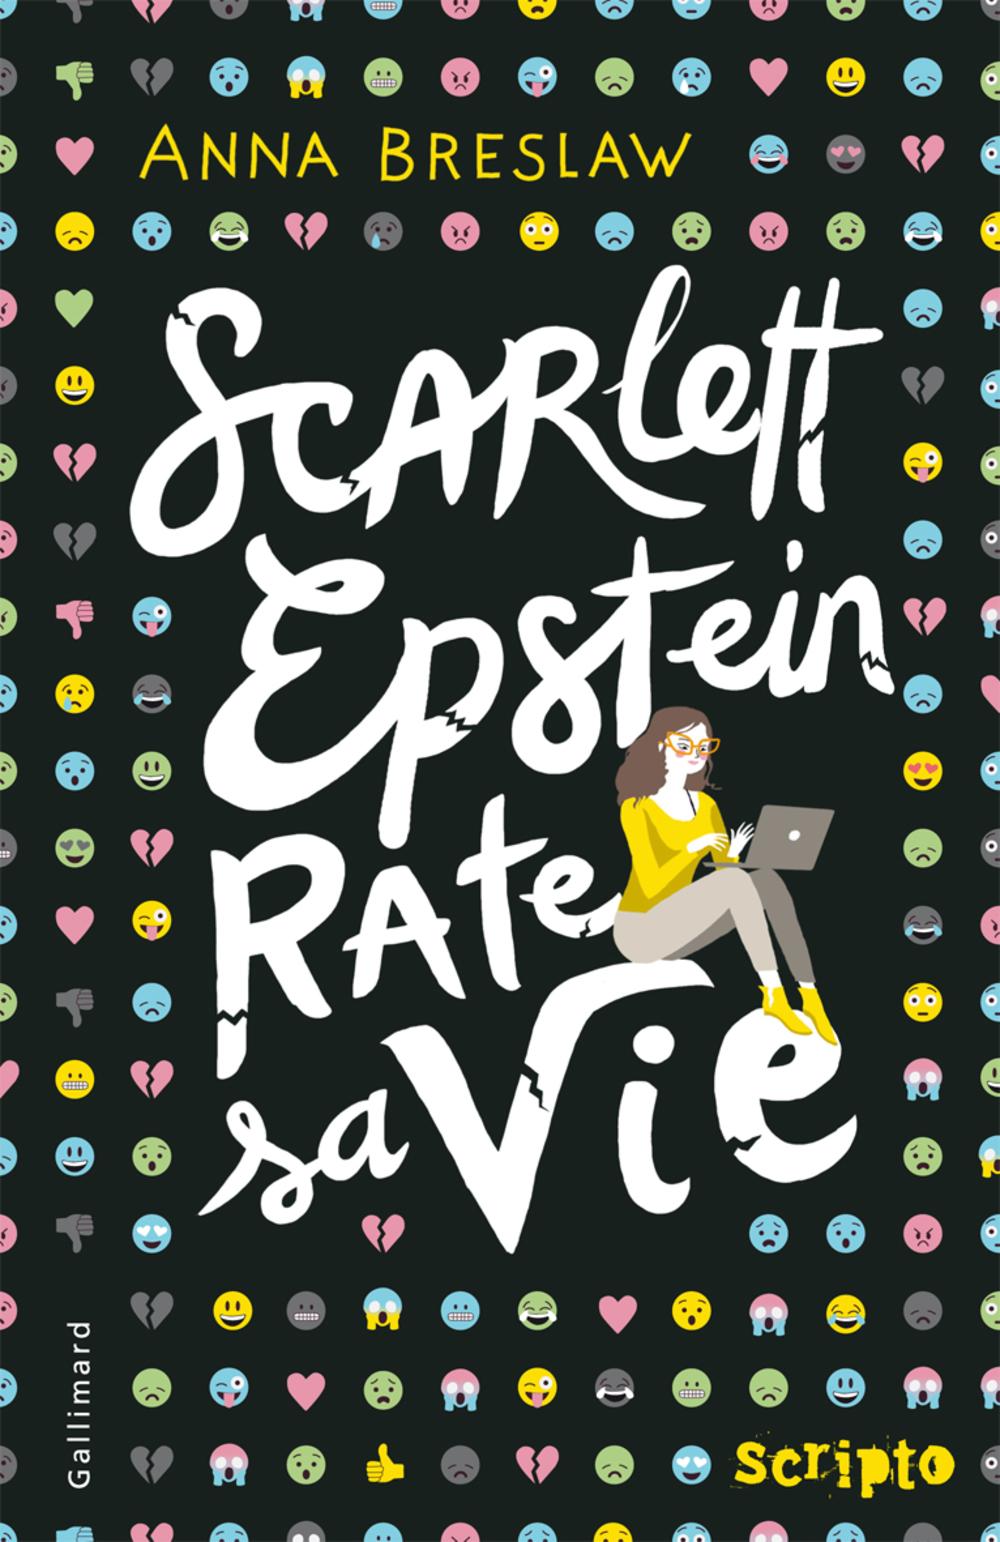 Scarlett Epstein rate sa vie | Breslaw, Anna